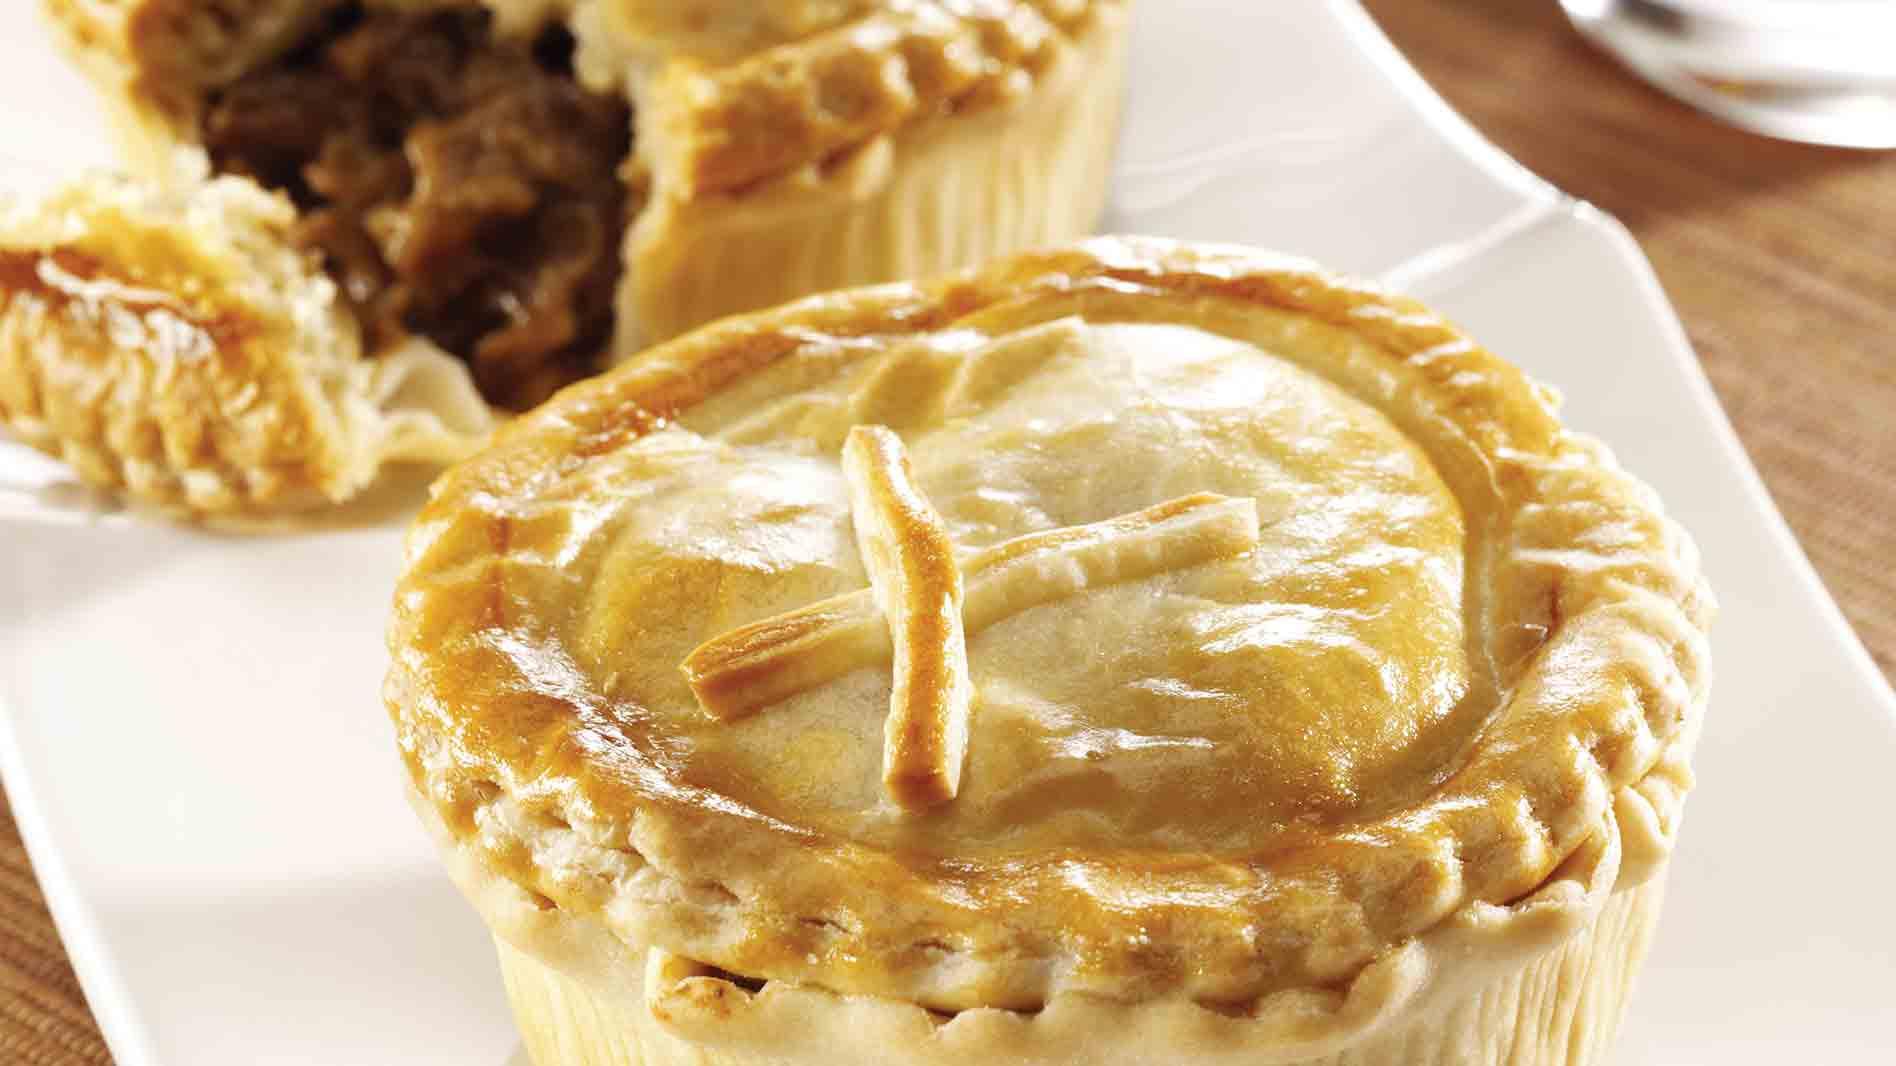 Pie Top Pastry